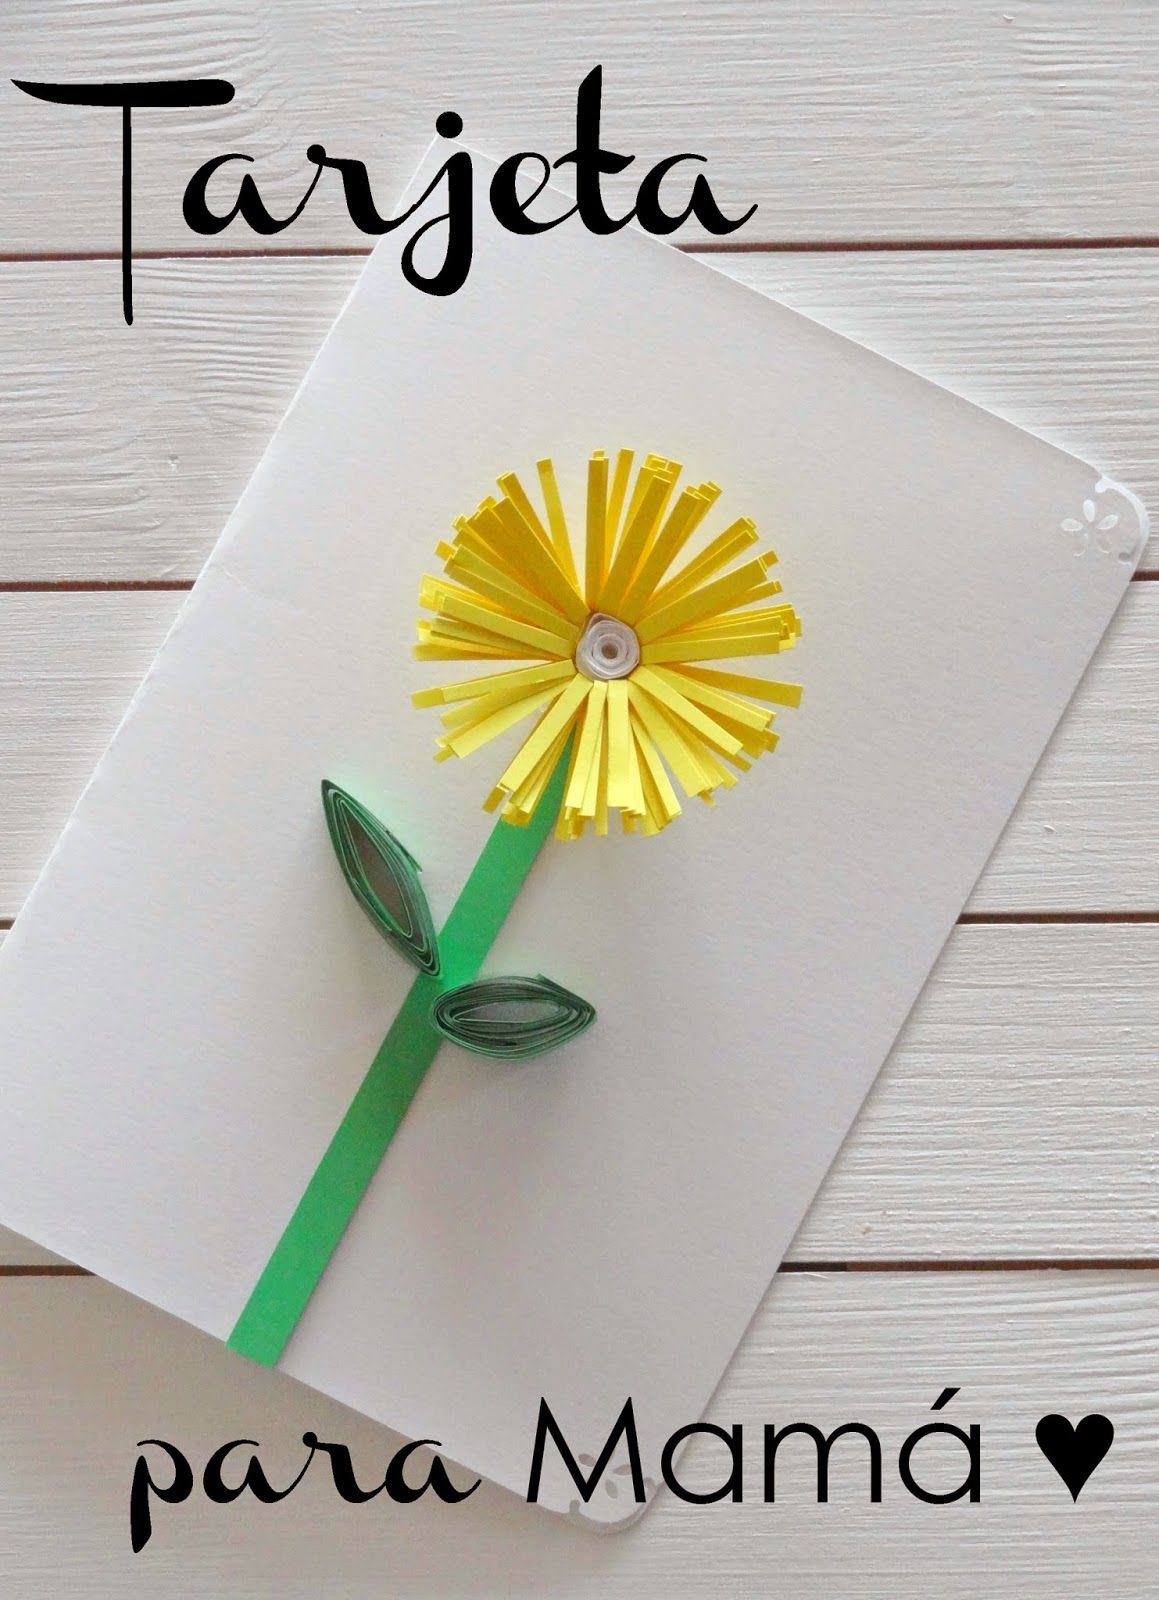 Tarjeta Para El Dia De La Madre Manualidades Tarjetas Faciles Tarjetas Para Mama